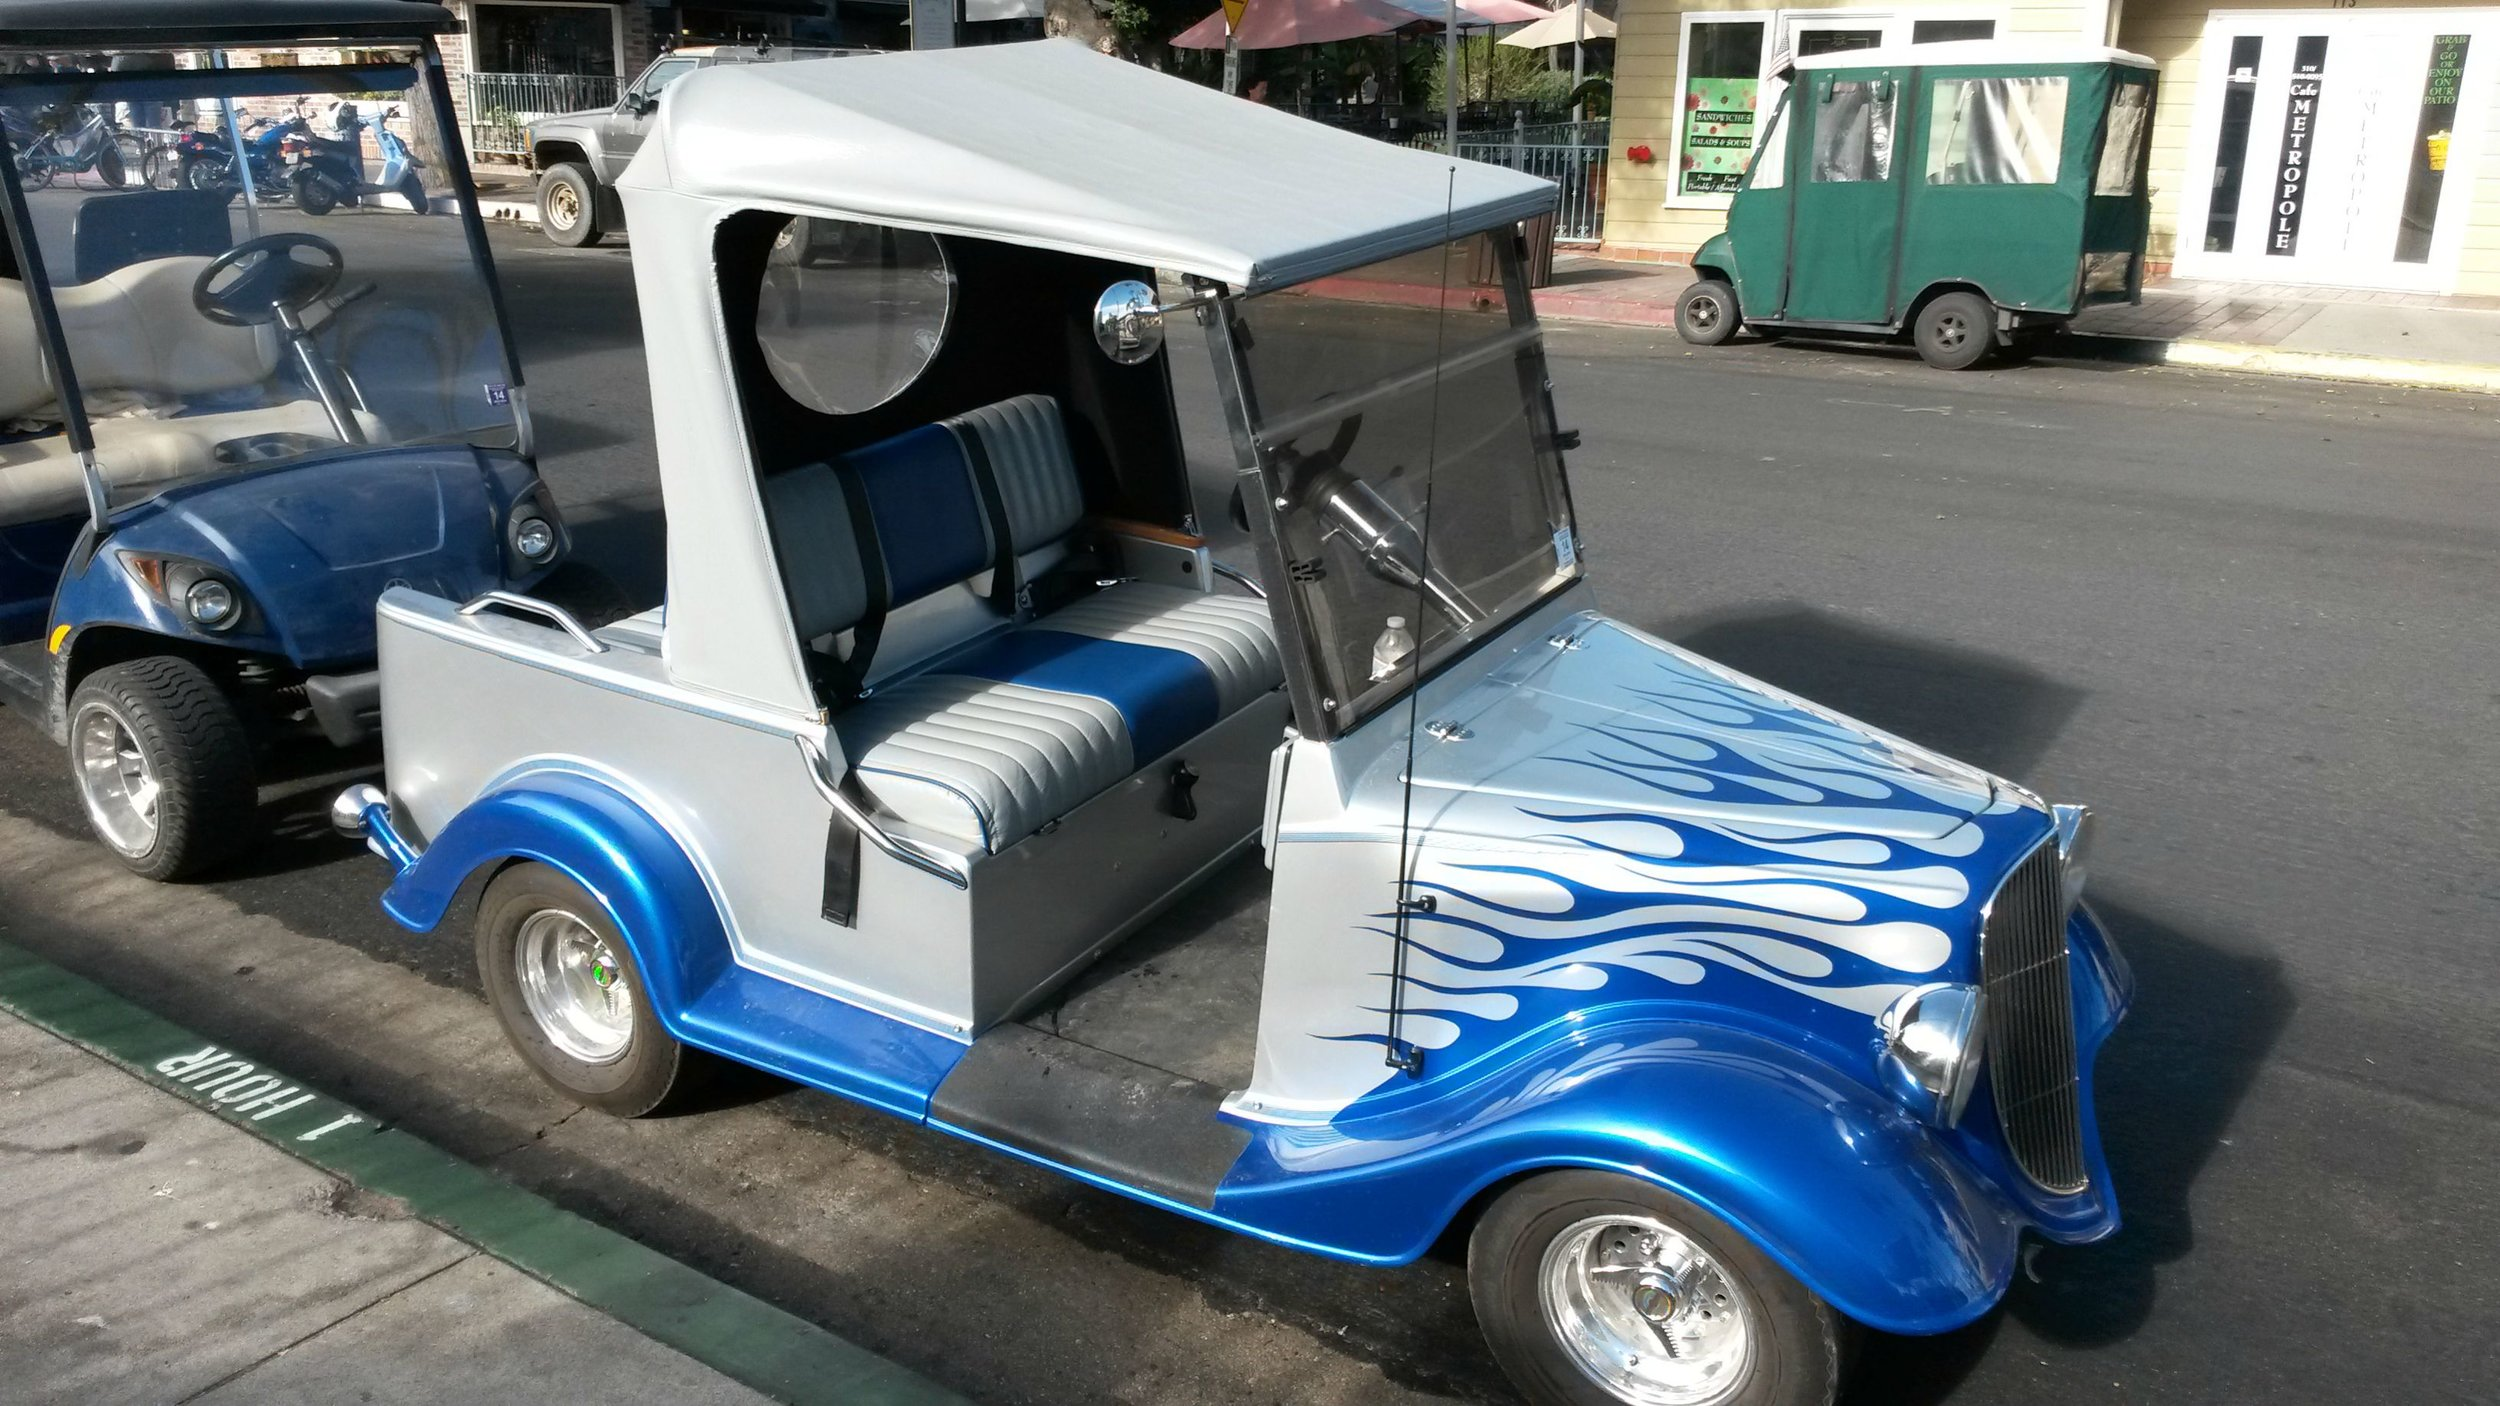 Now THAT'S a golf cart...